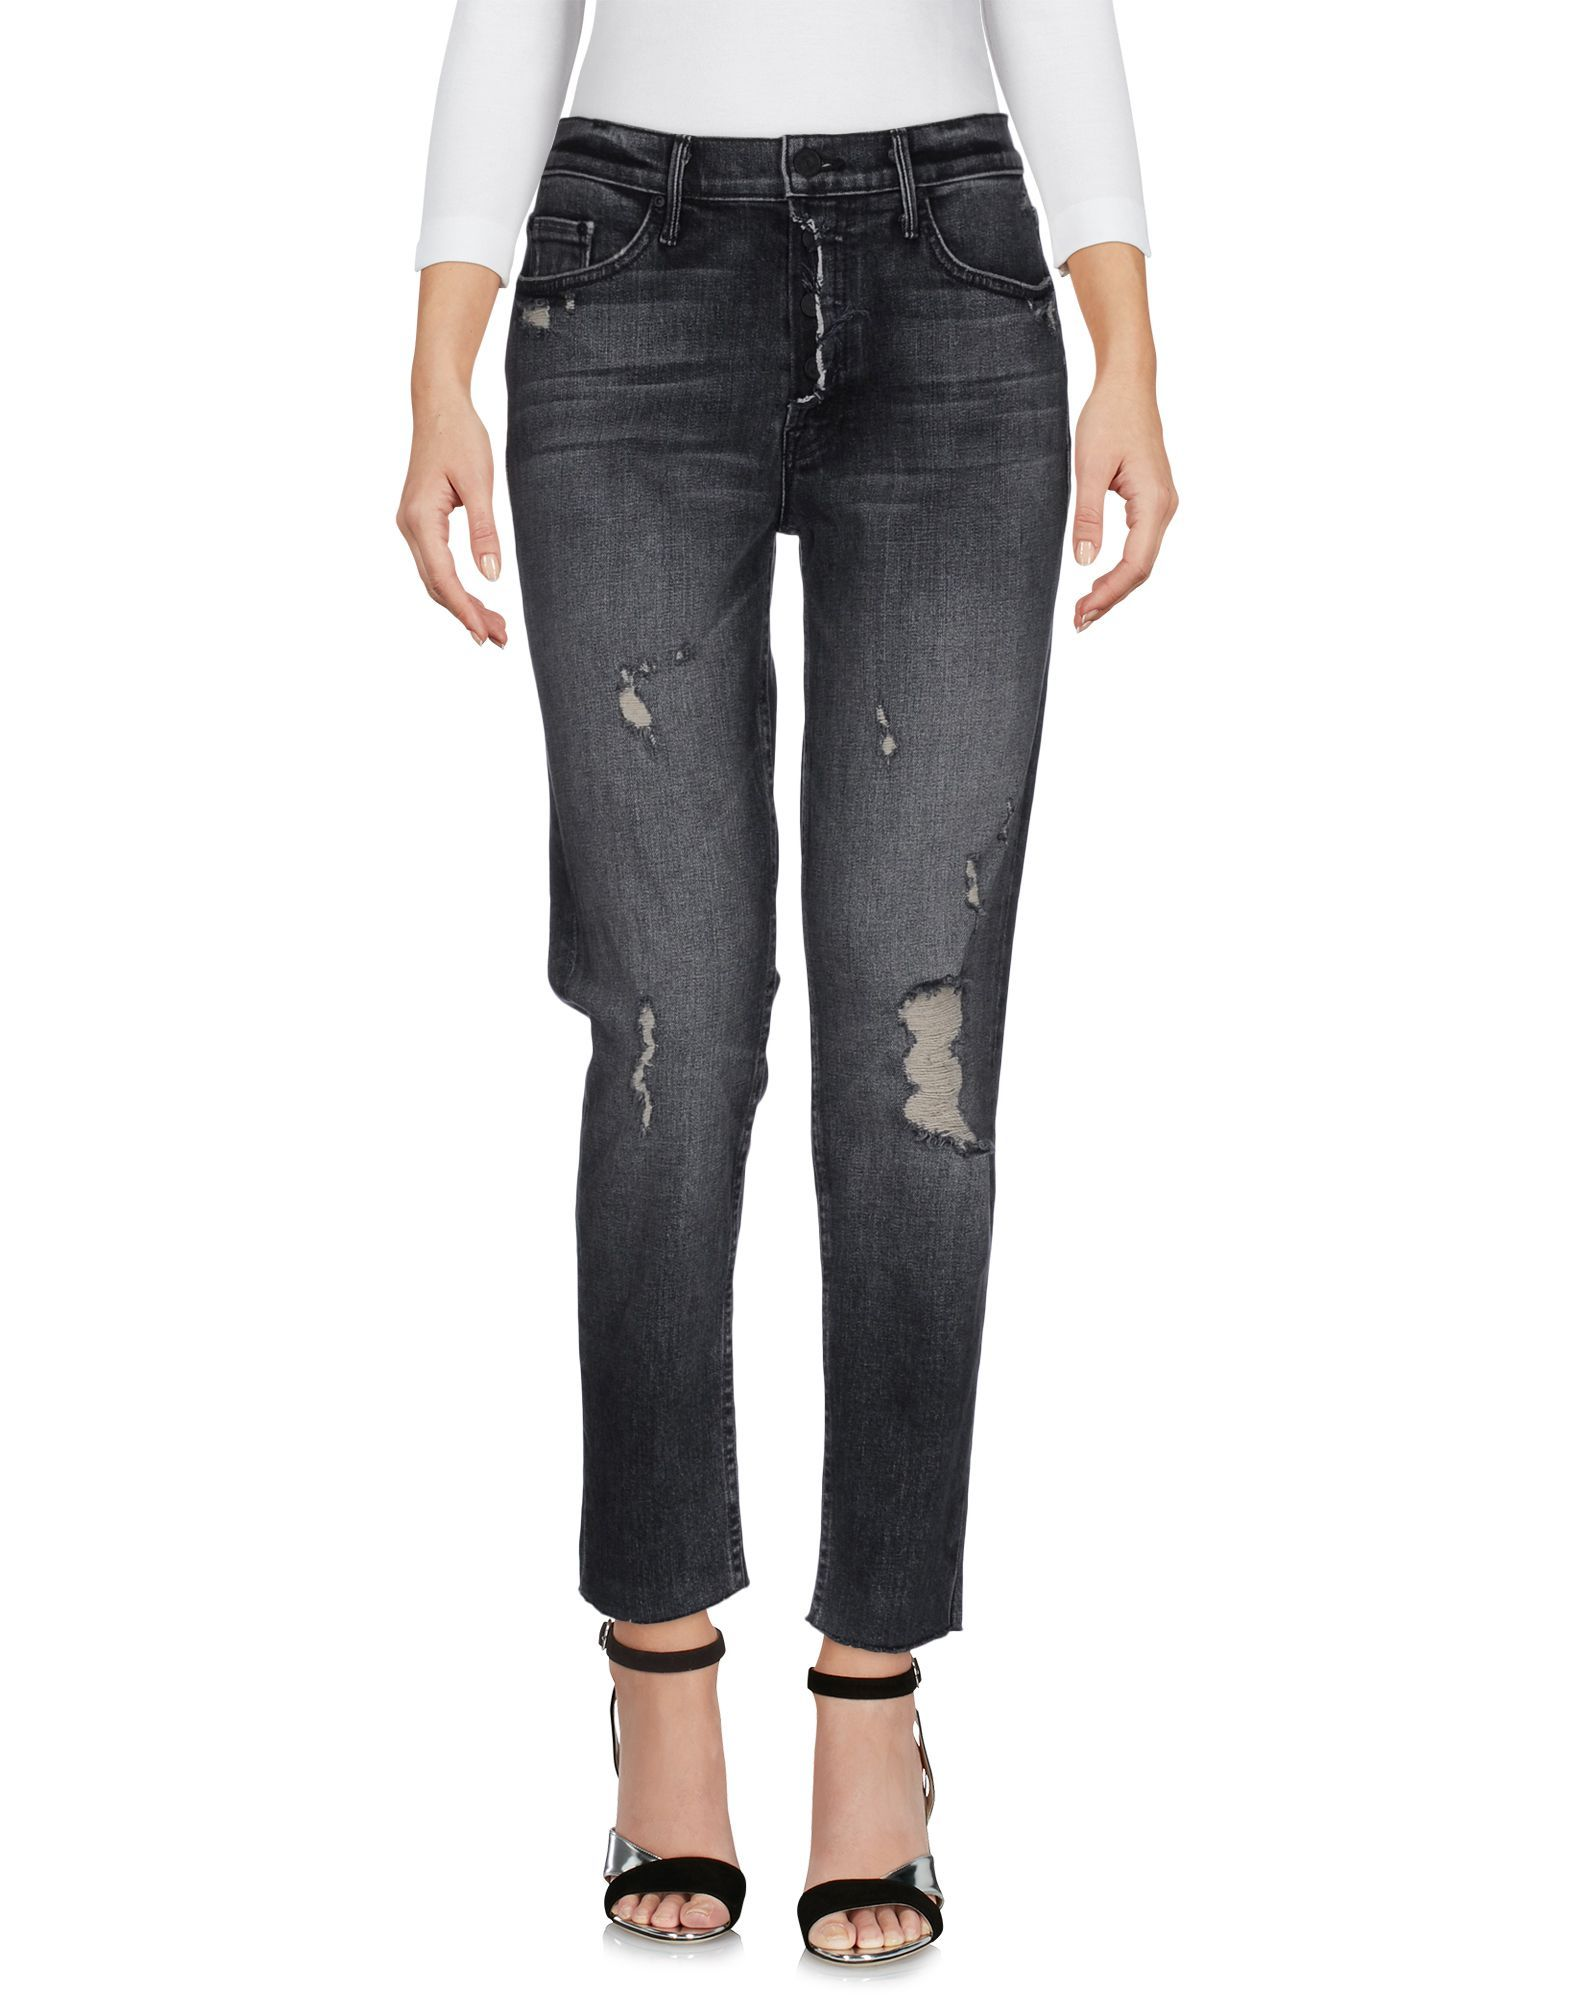 Black denim trousers